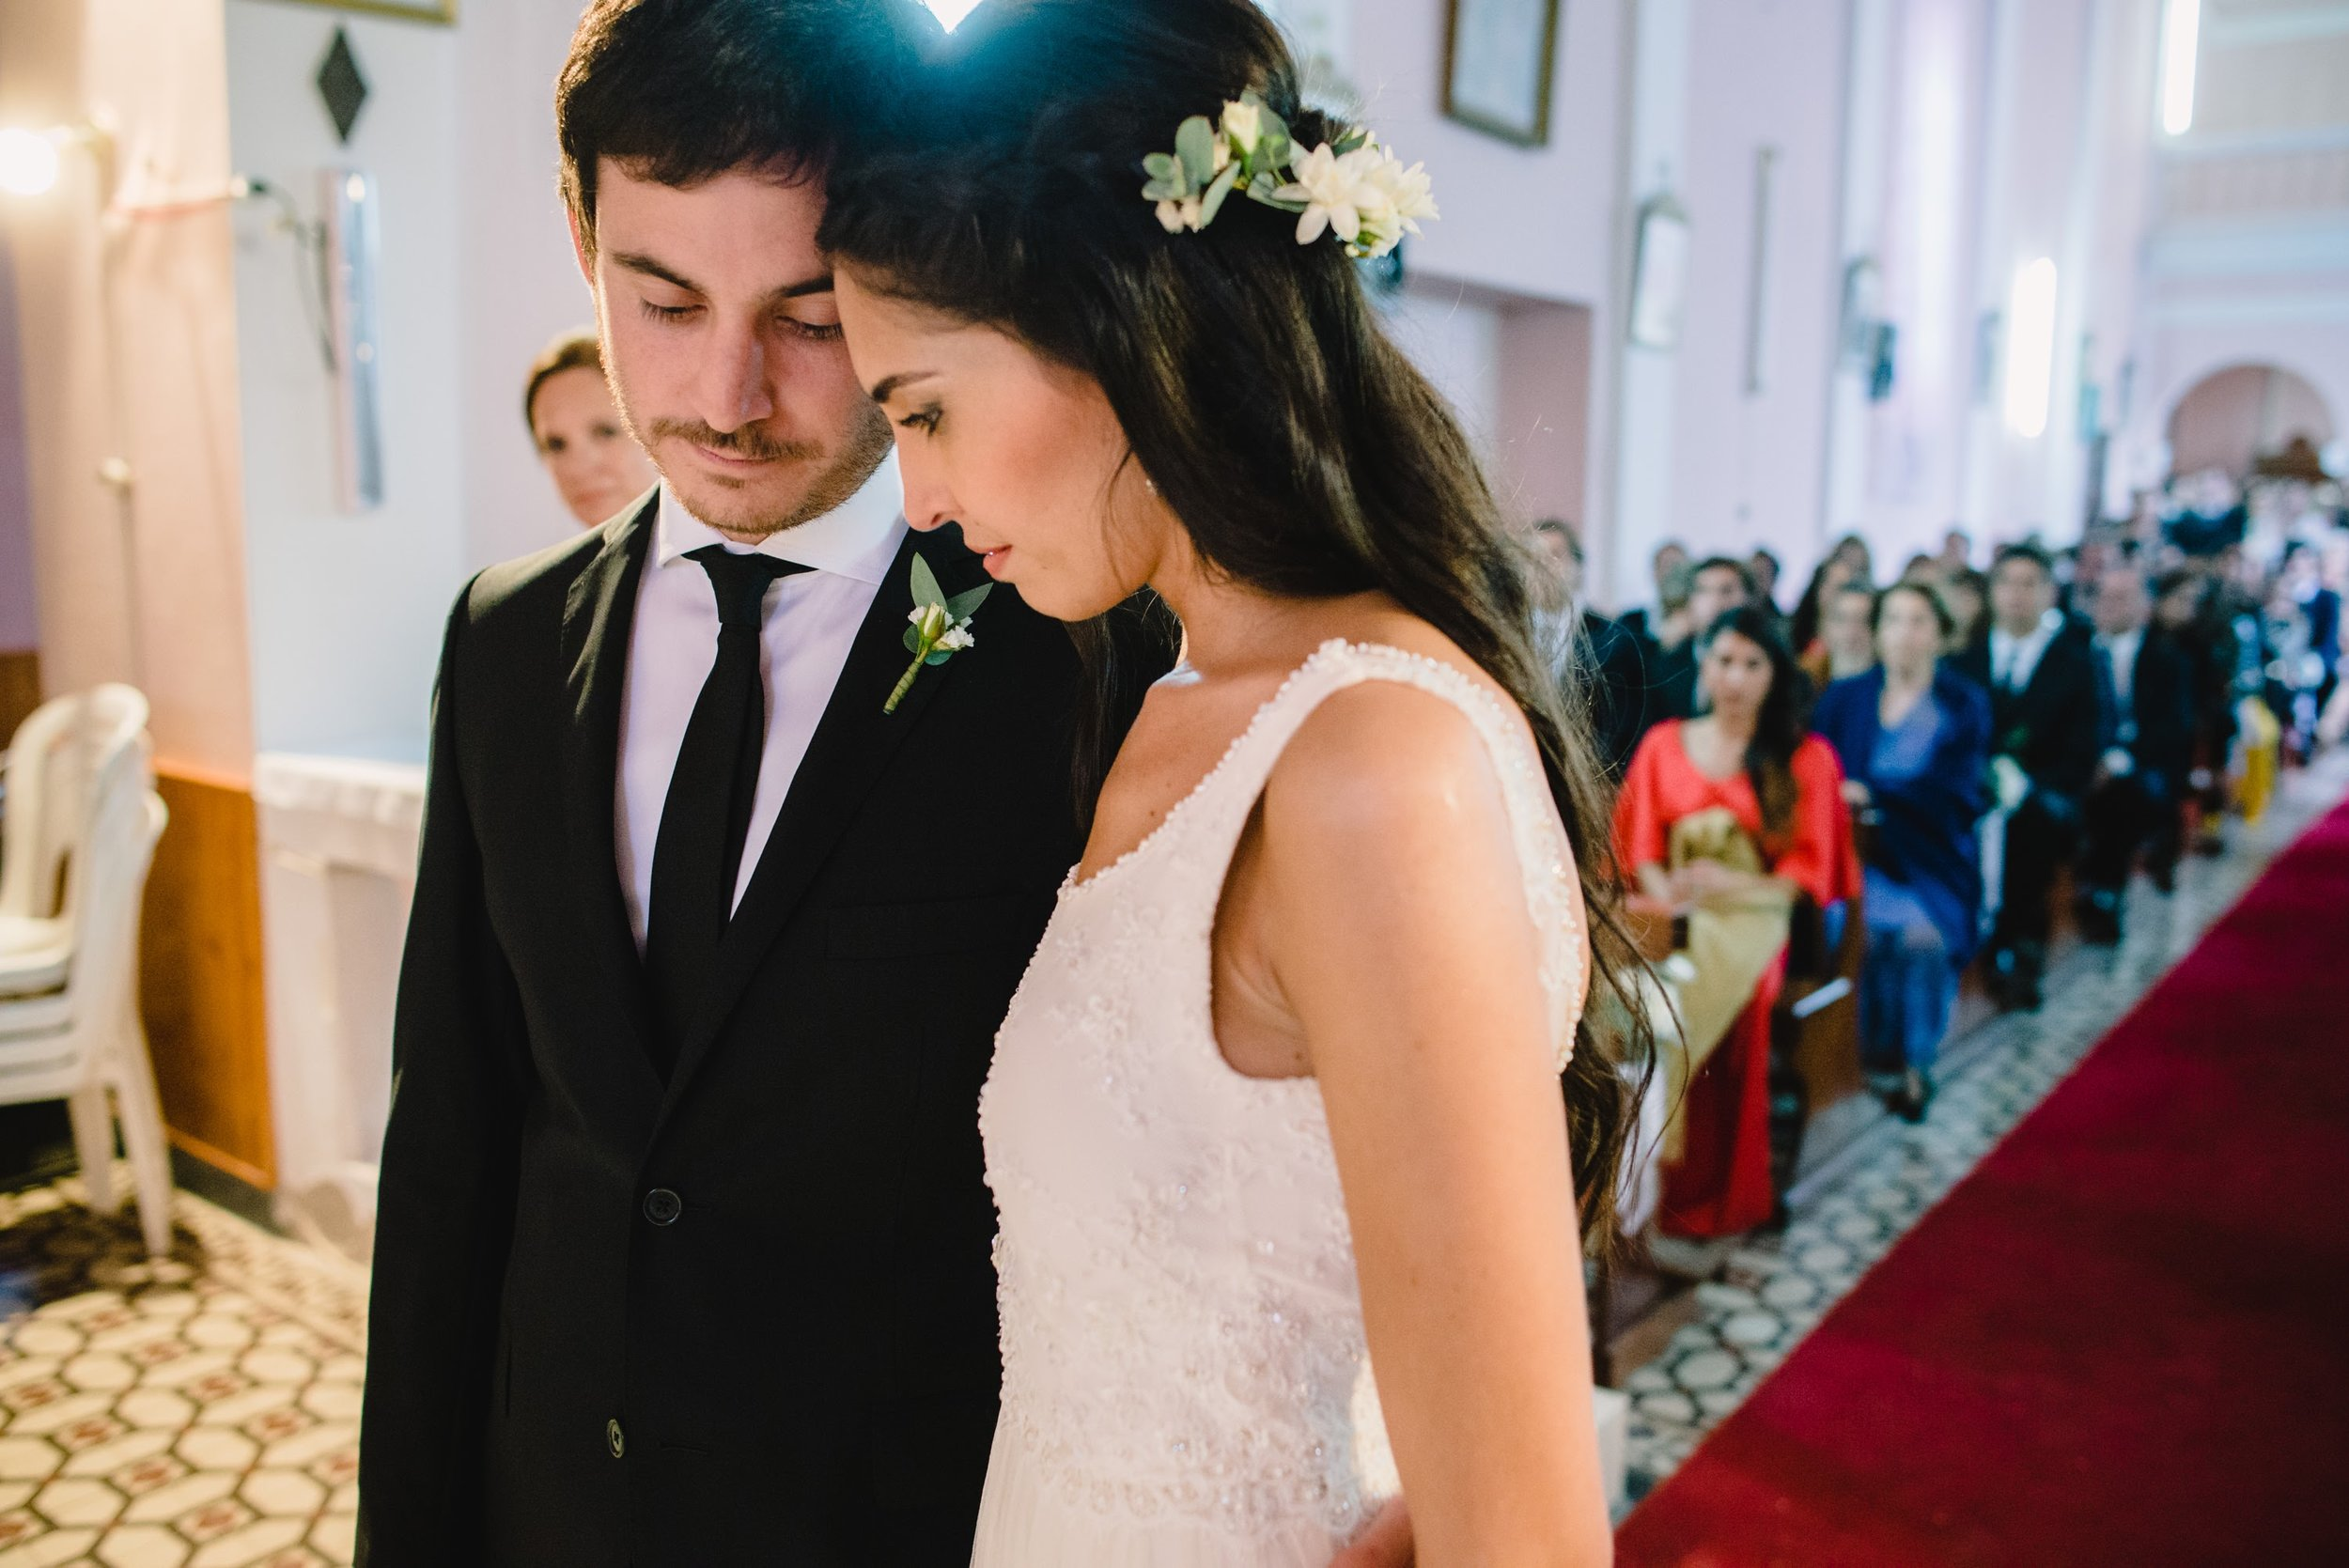 fotografo de bodas en carlos paz cordoba 030.JPG